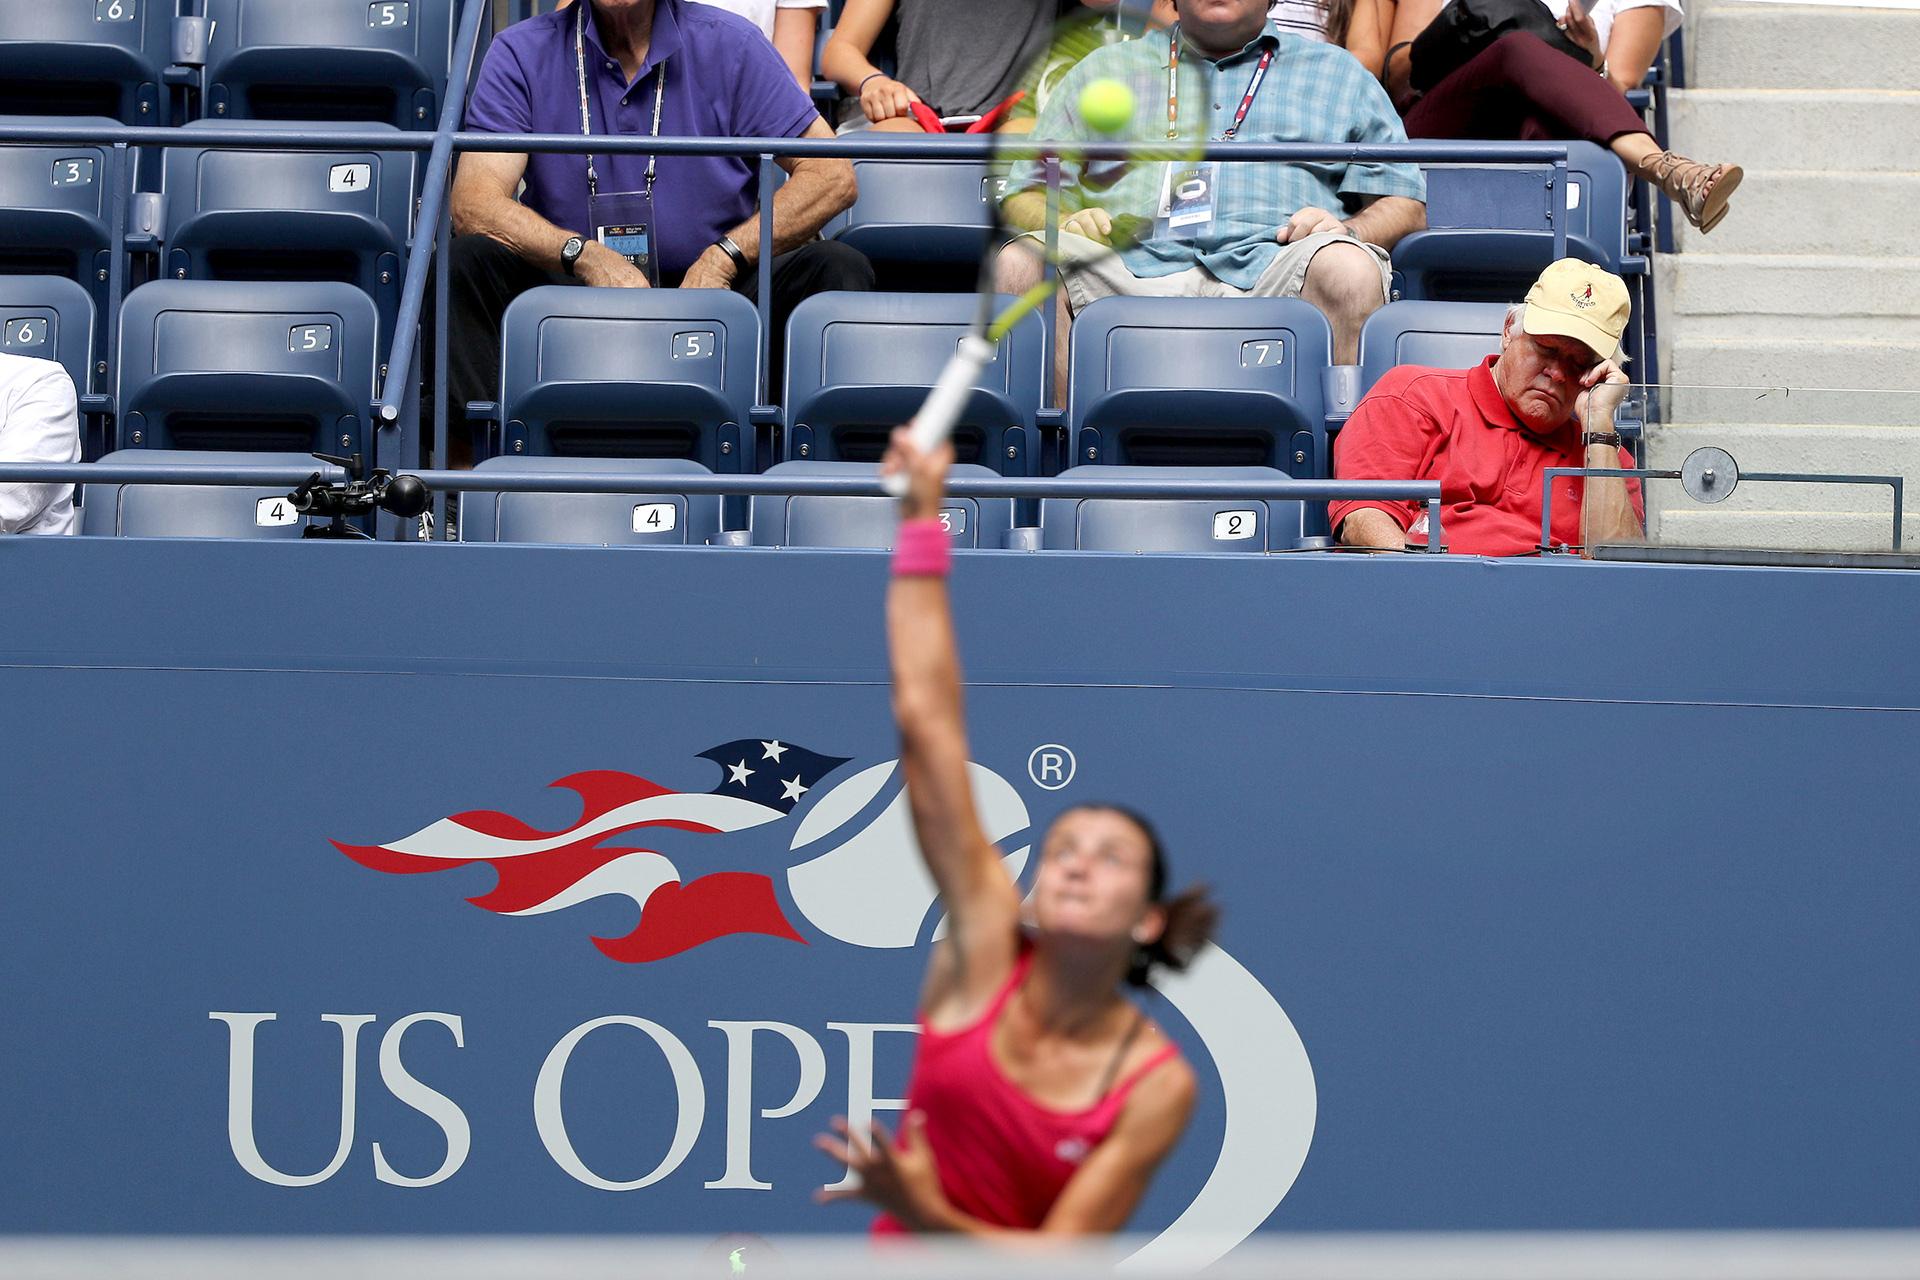 040916_Tennis_USOpen_0510